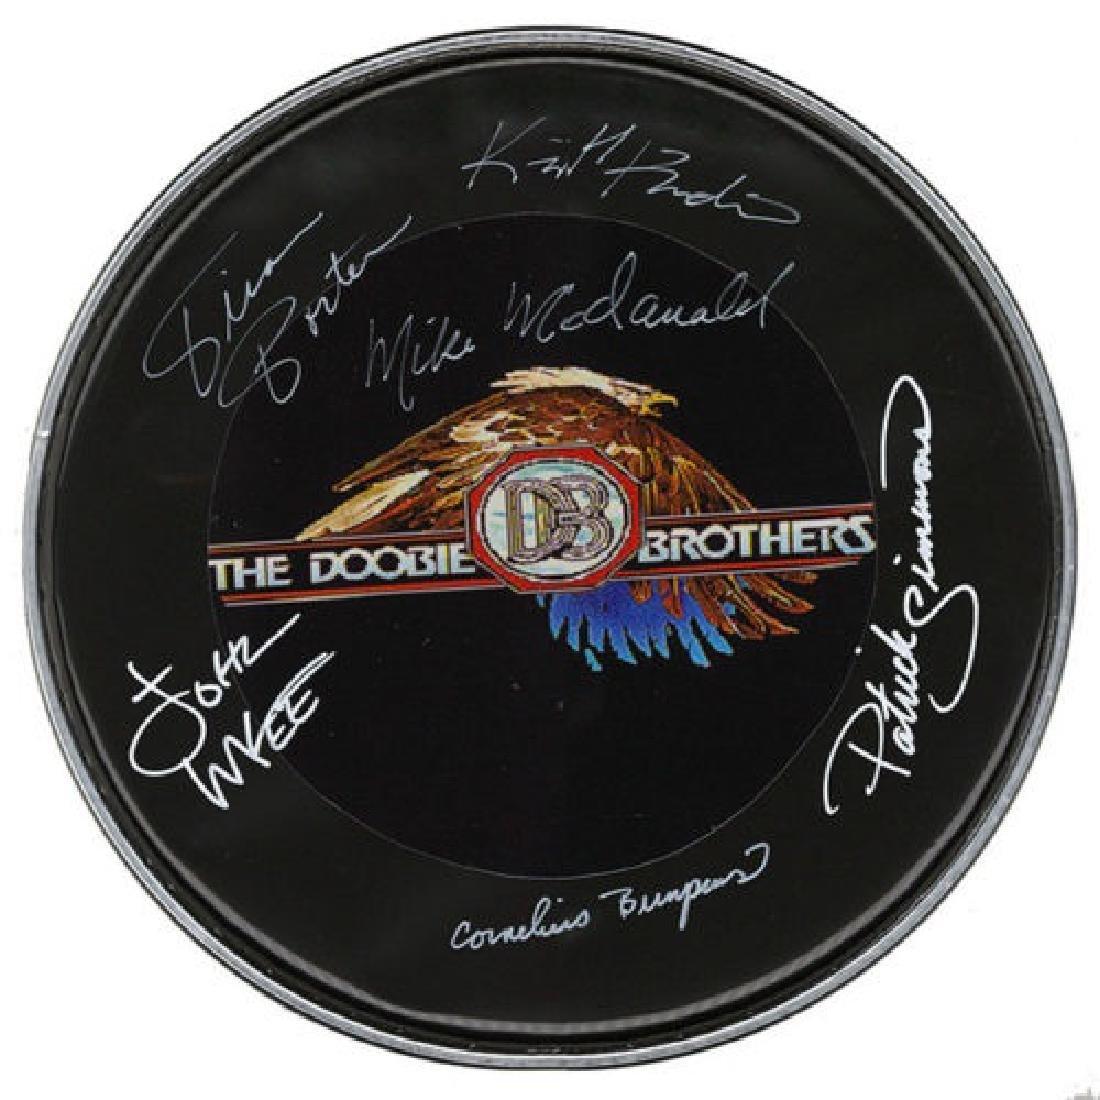 Doobie Brothers Autographed Drum Head